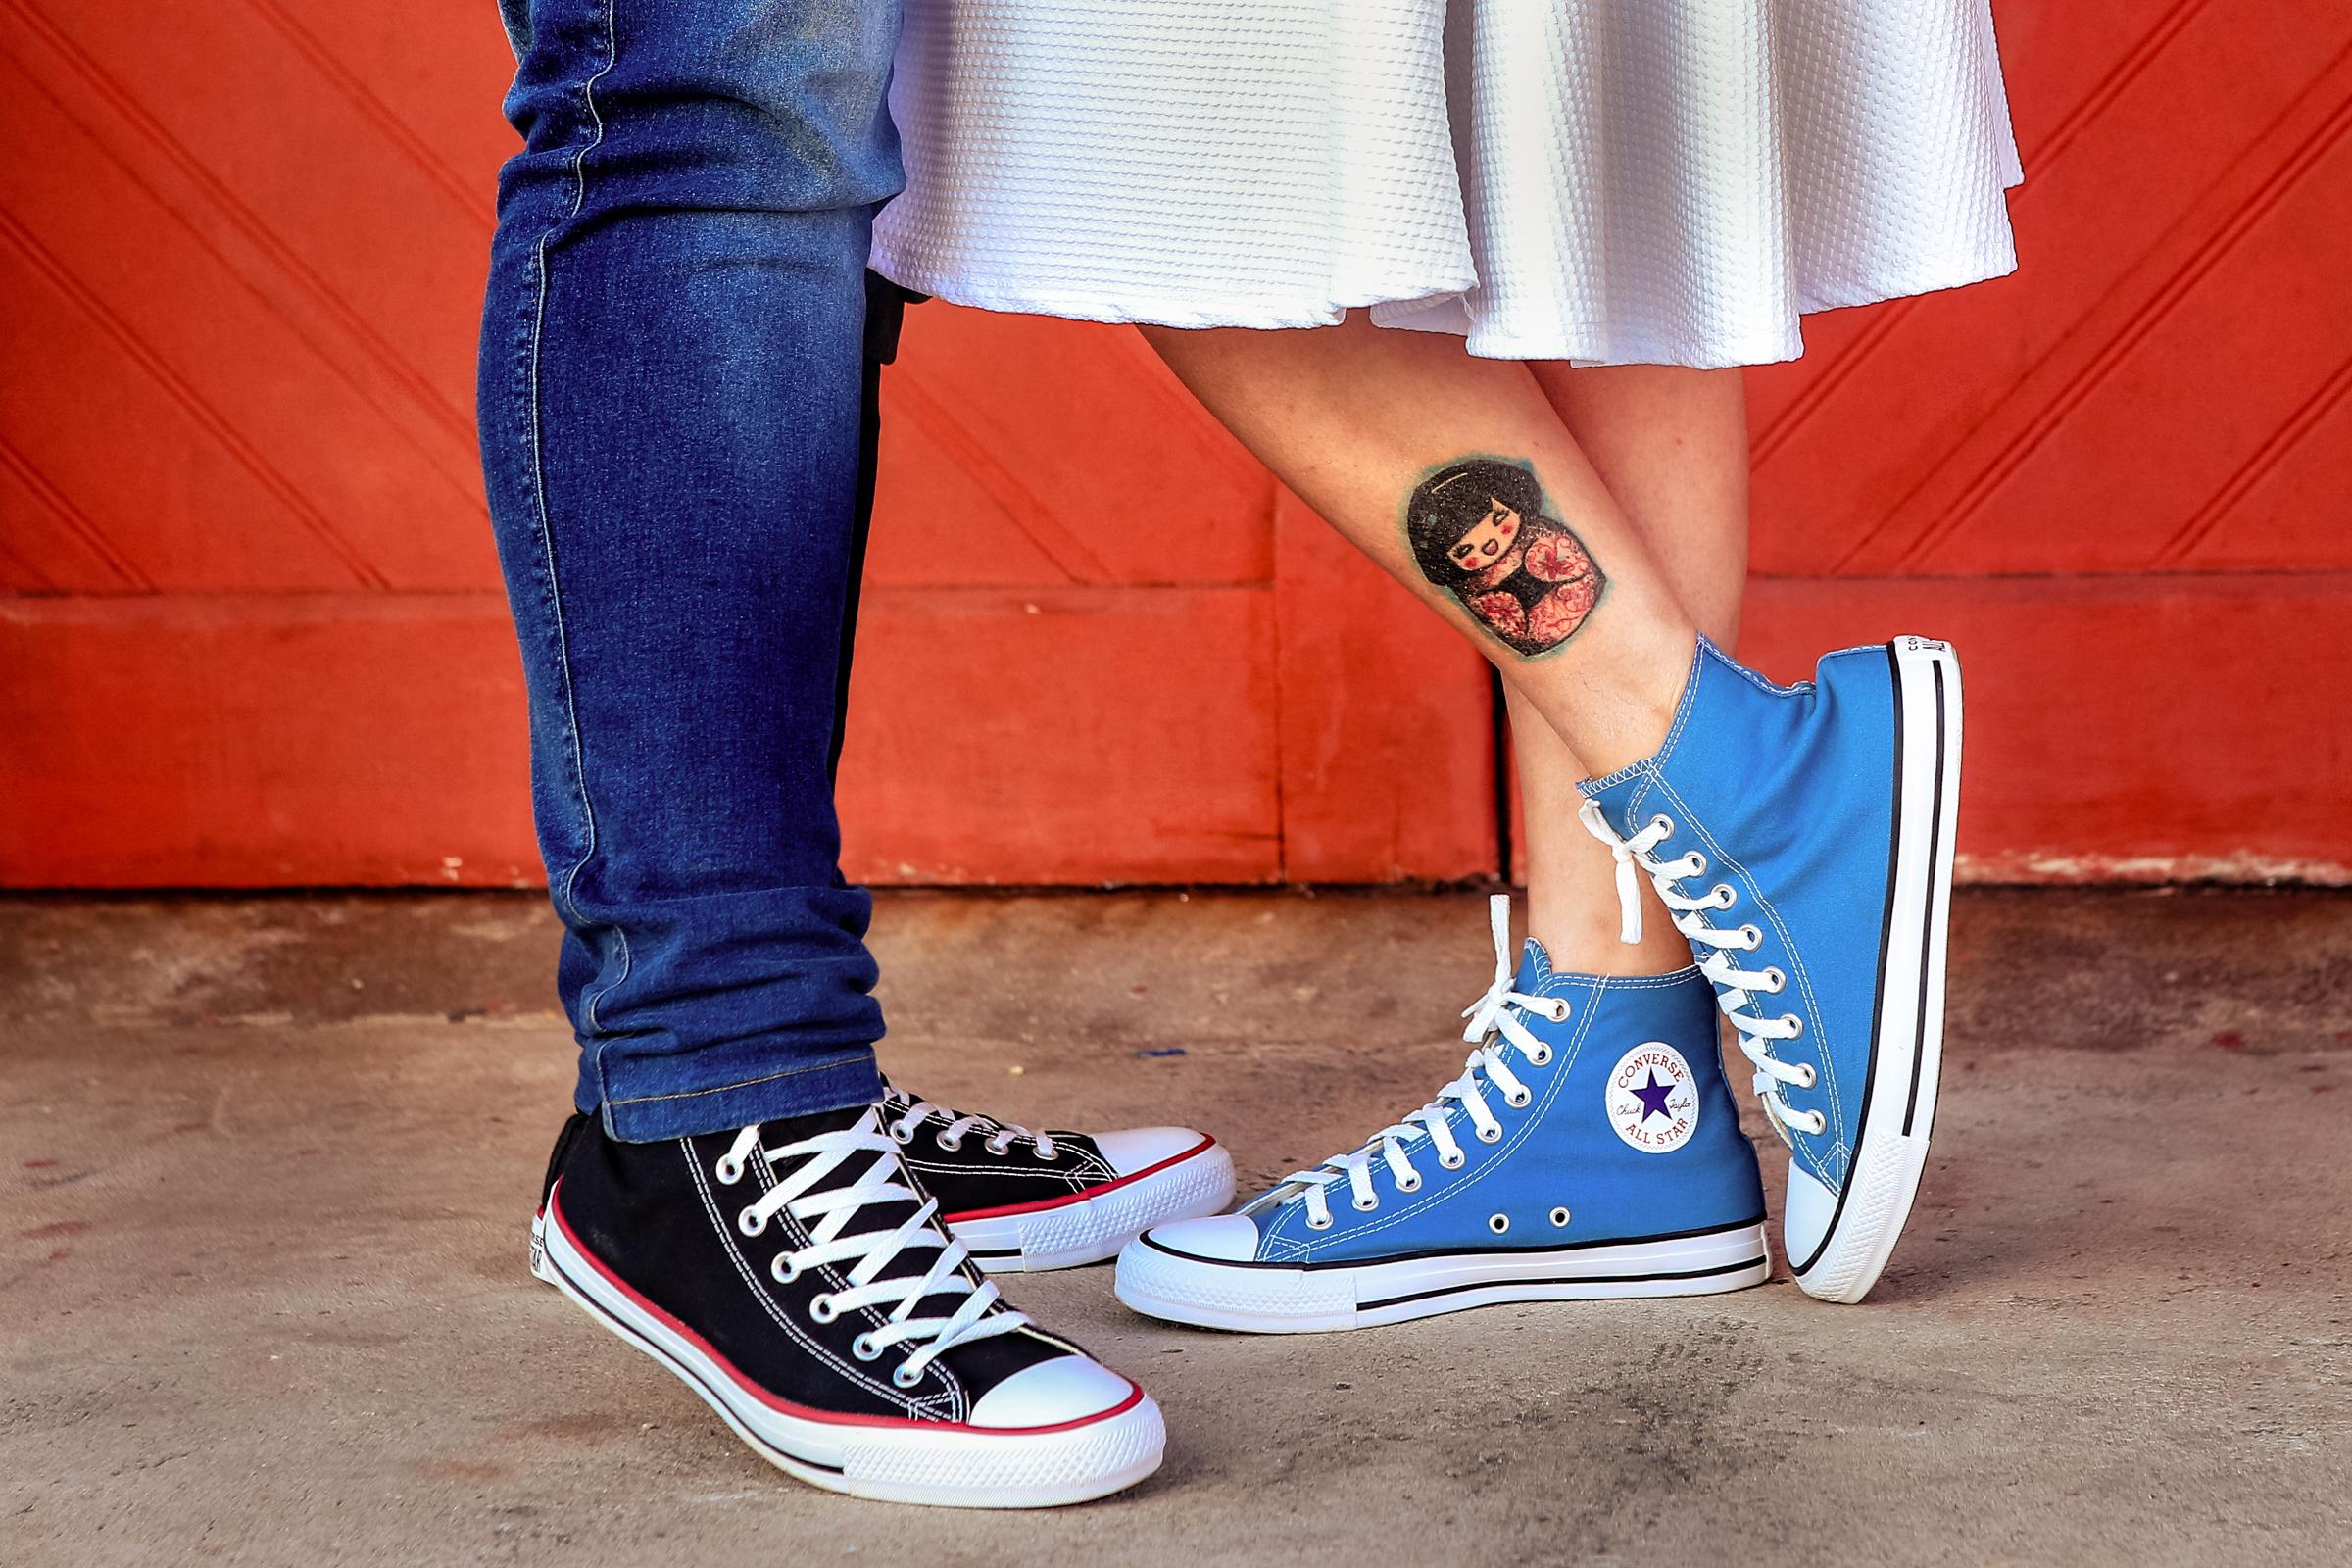 jeans-converse-and-a-tattoo-area-da-fotografia